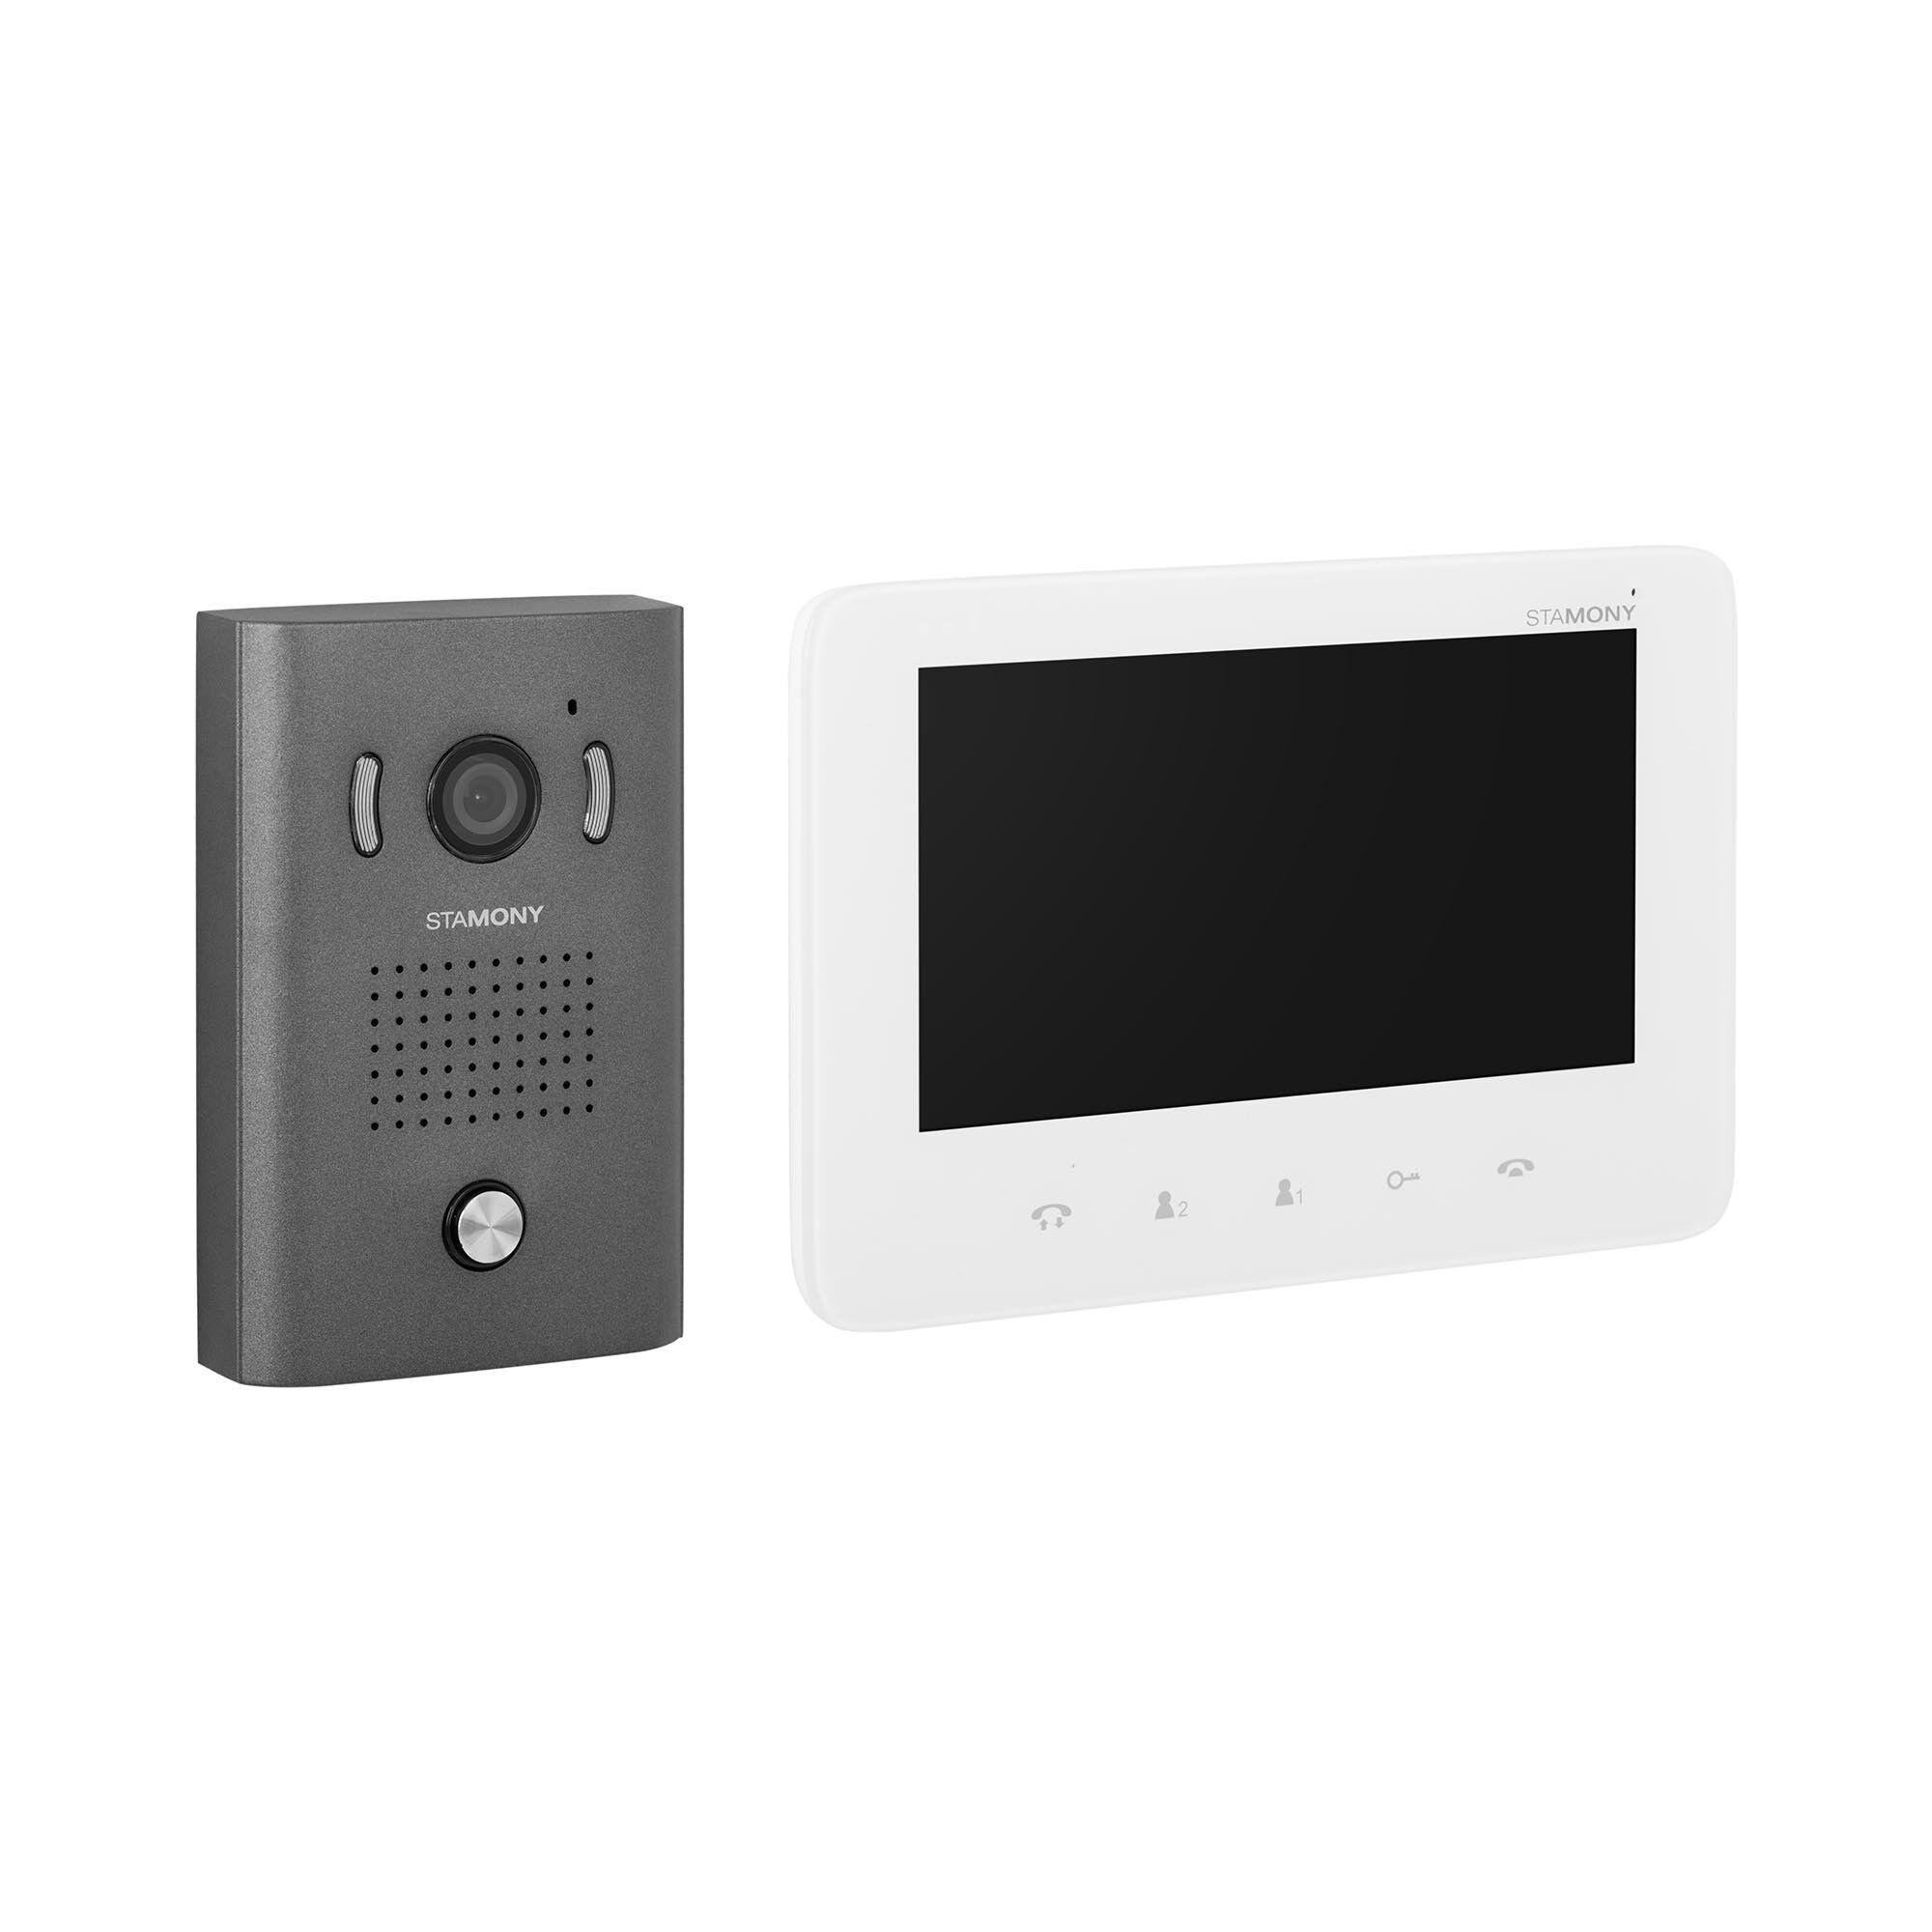 Stamony Videodørtelefon - display 17,8 cm ST-VP-400